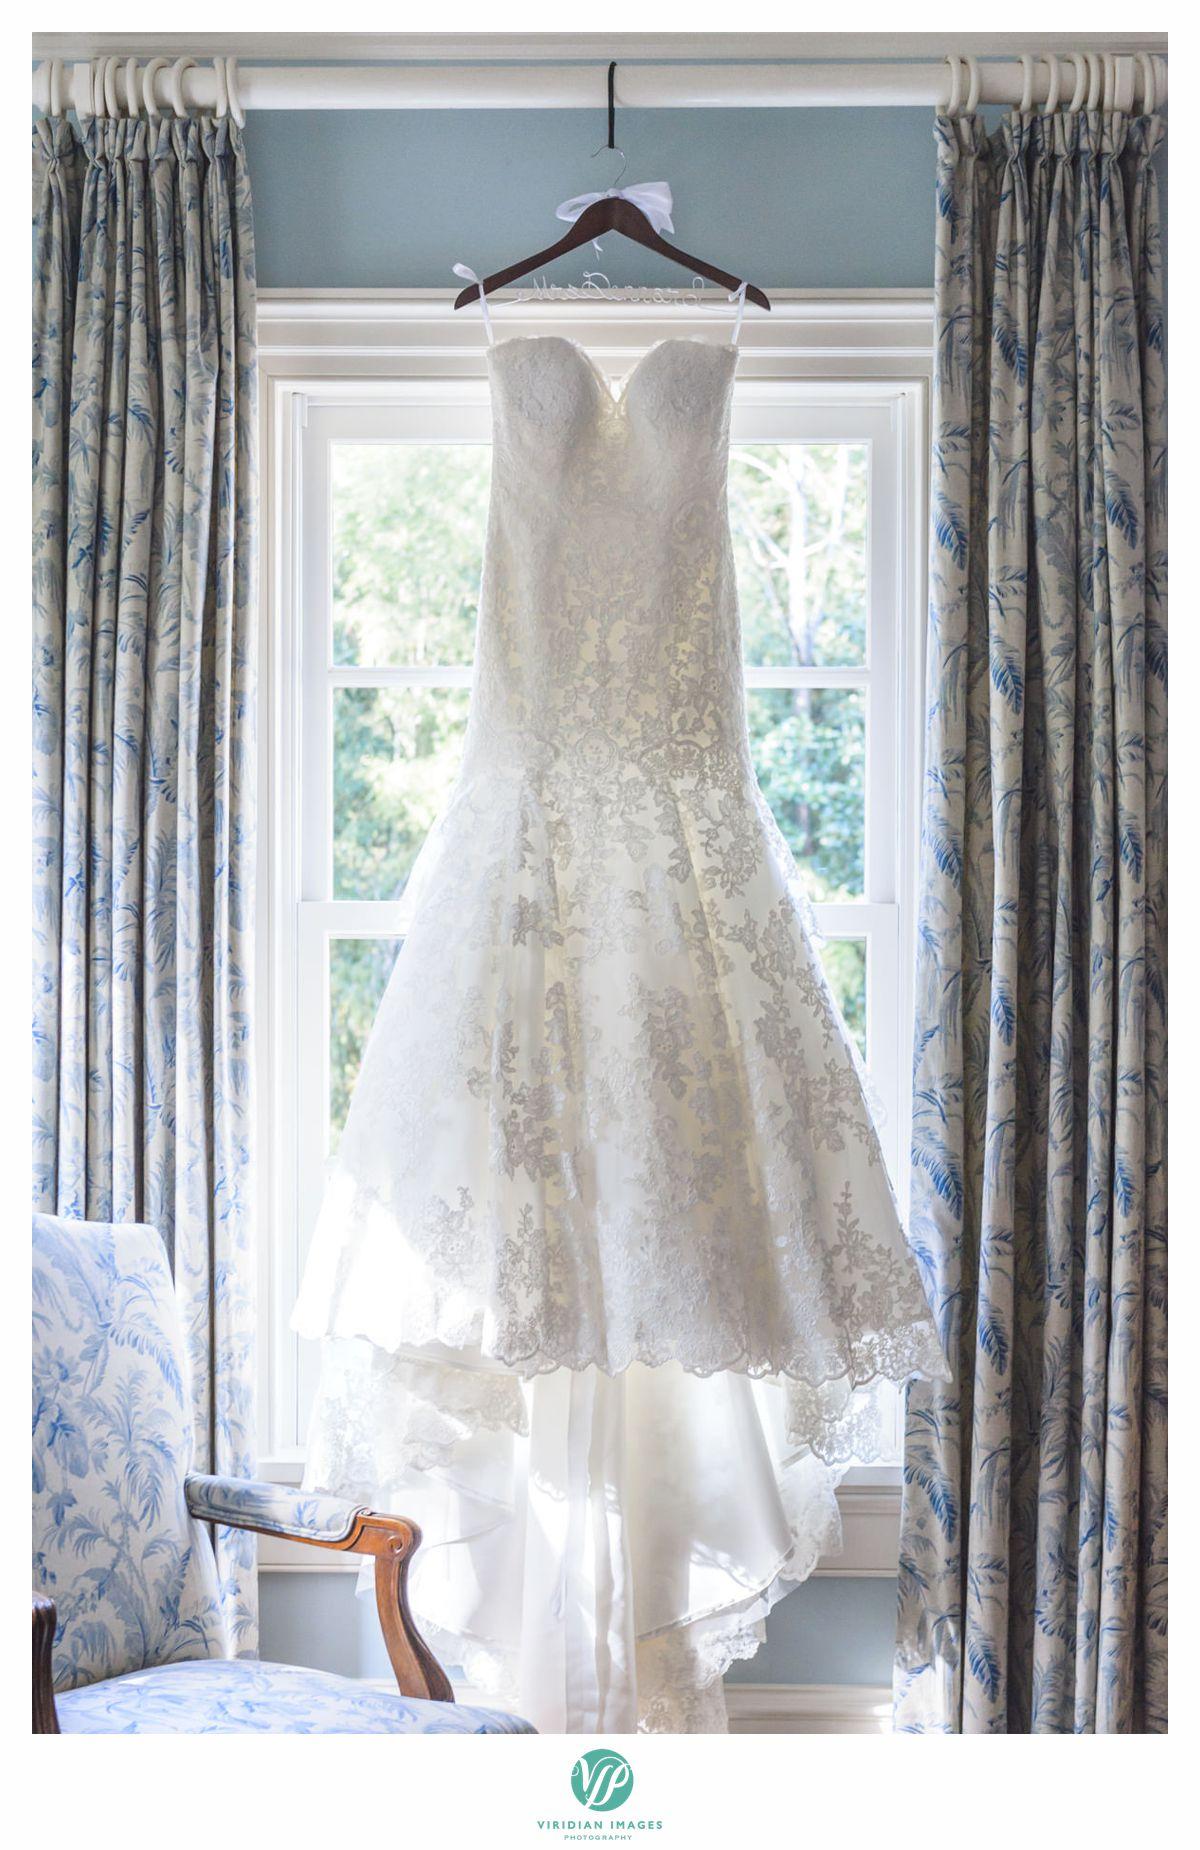 wedding dress in bridal room